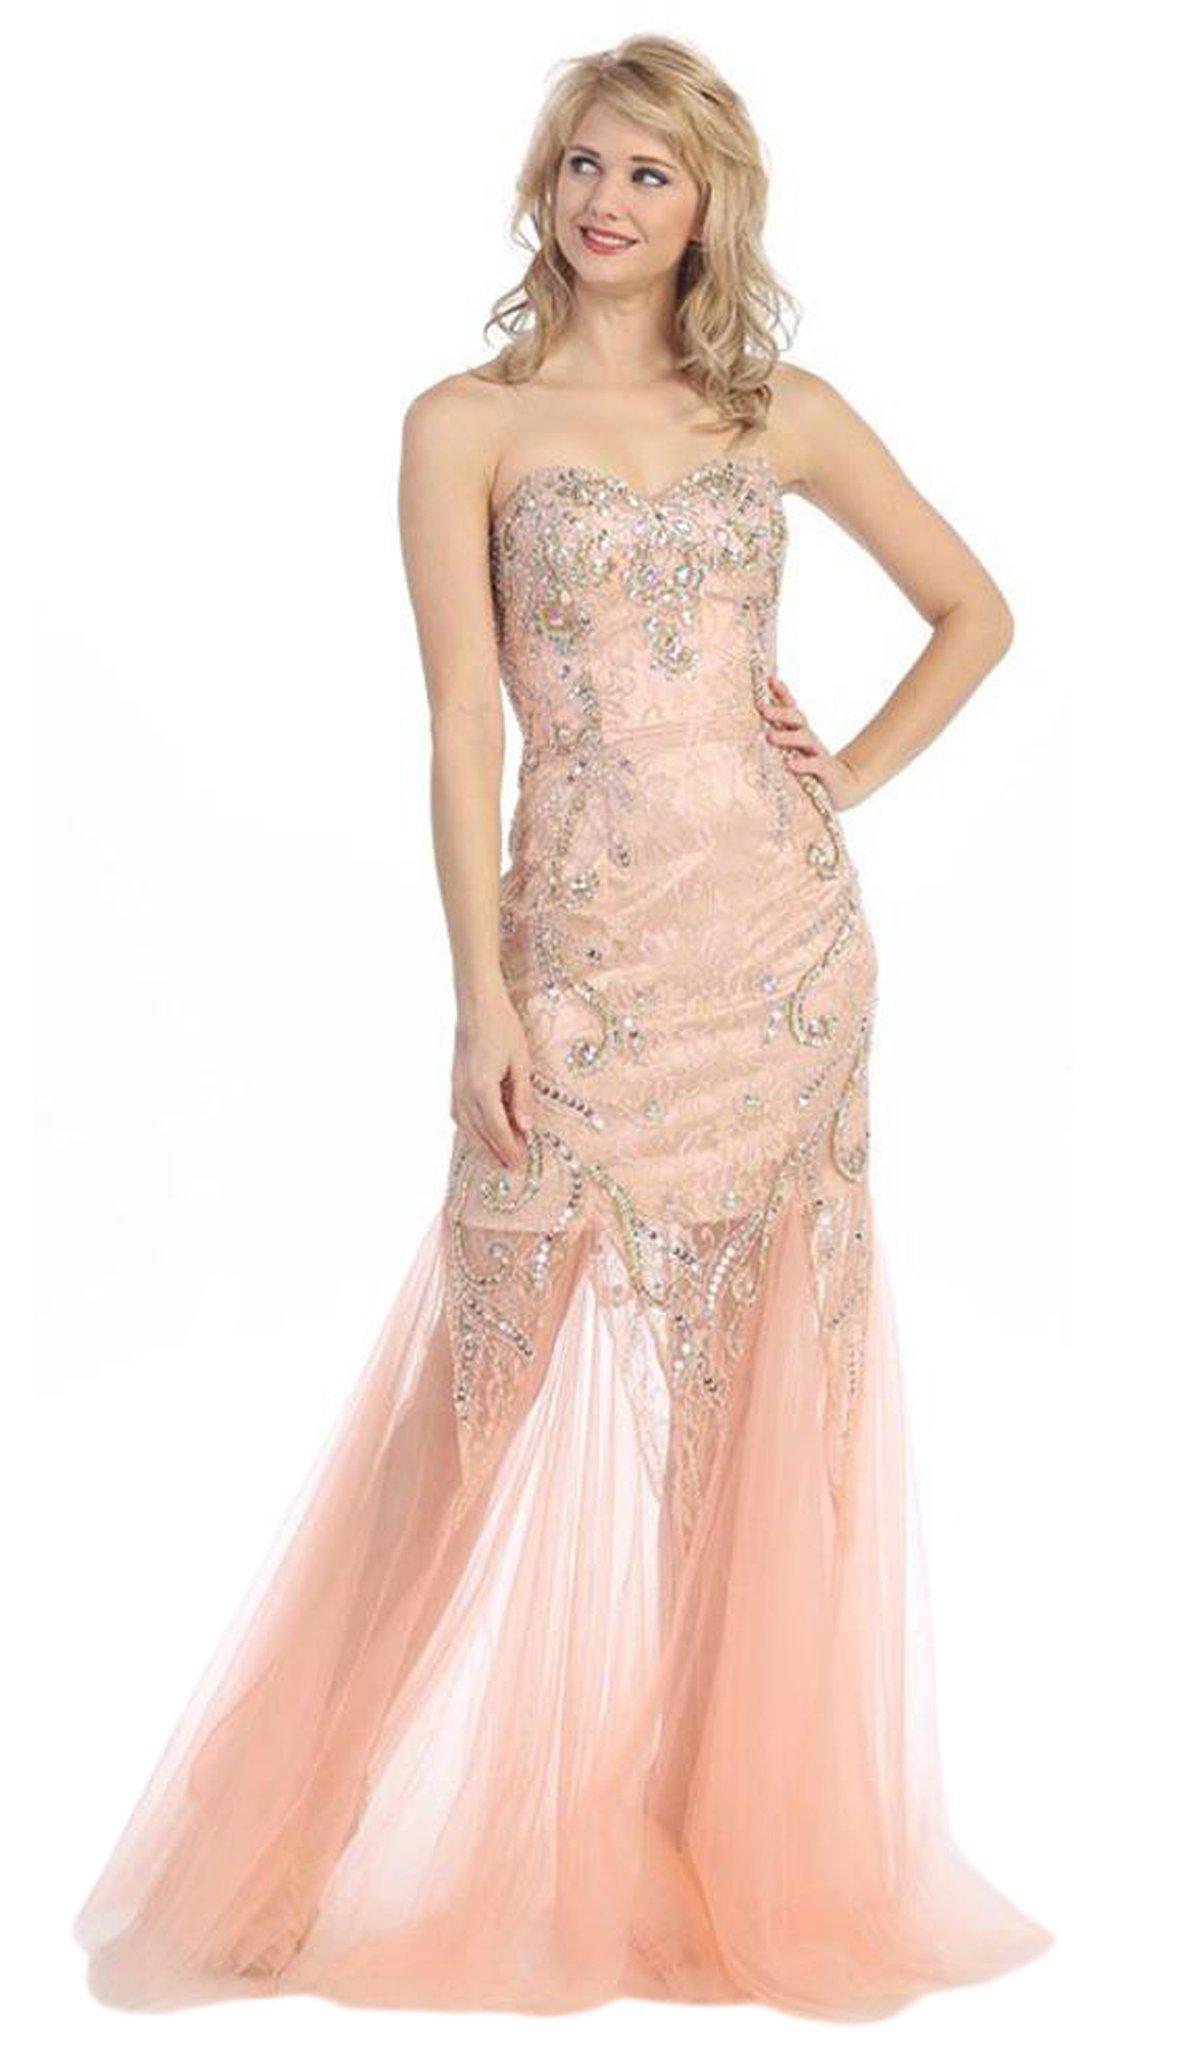 Eureka Fashion - 3152 Beaded Lace Sweetheart Mesh Trumpet Dress